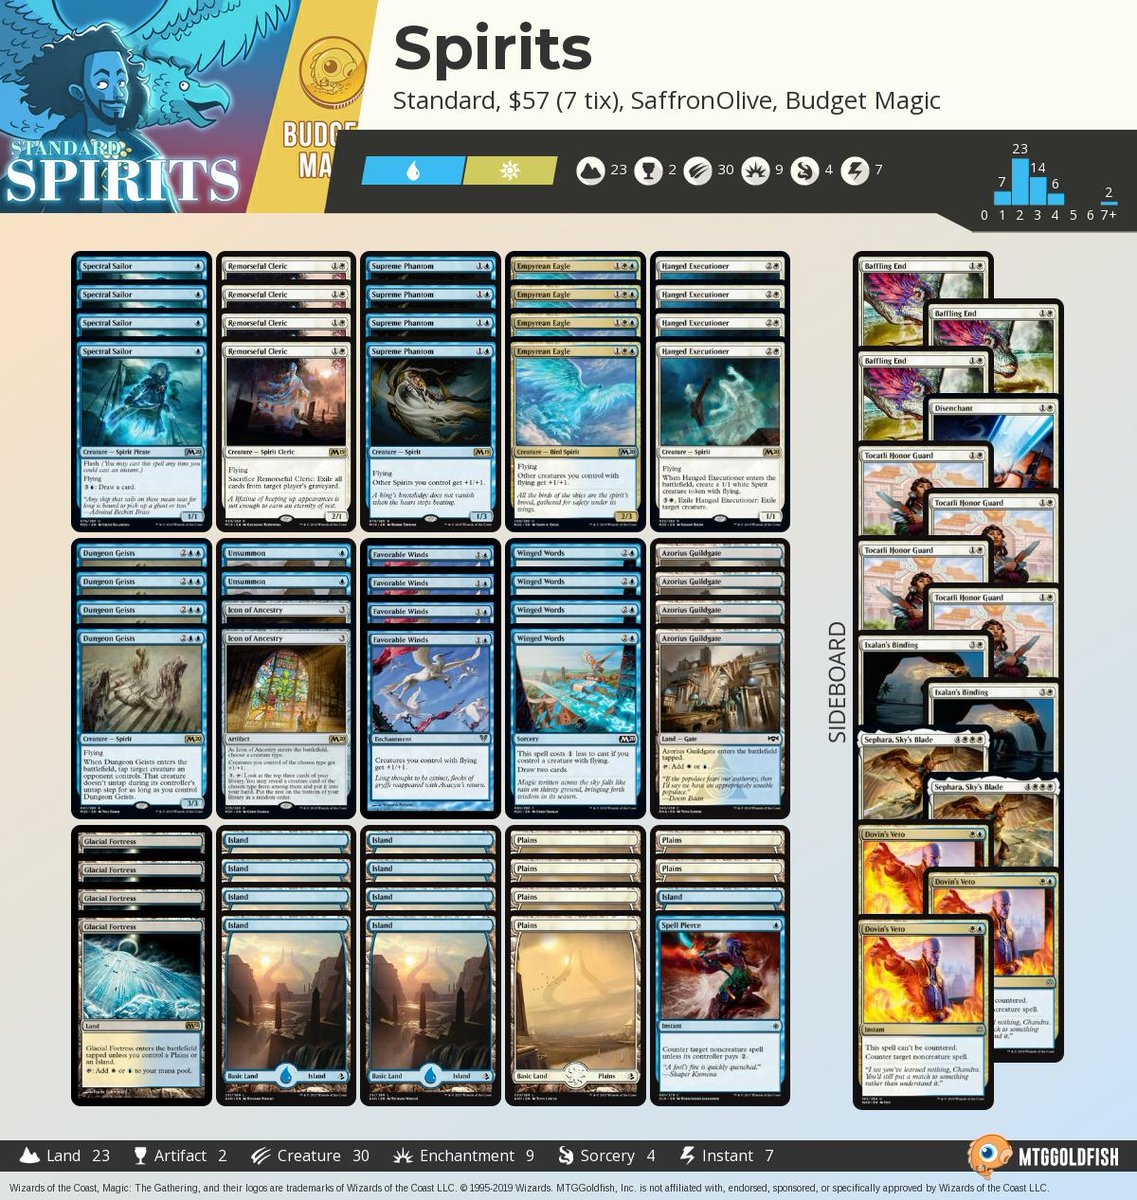 Budget Magic: $58 Spirits (Standard, Magic Arena) Tweet added by